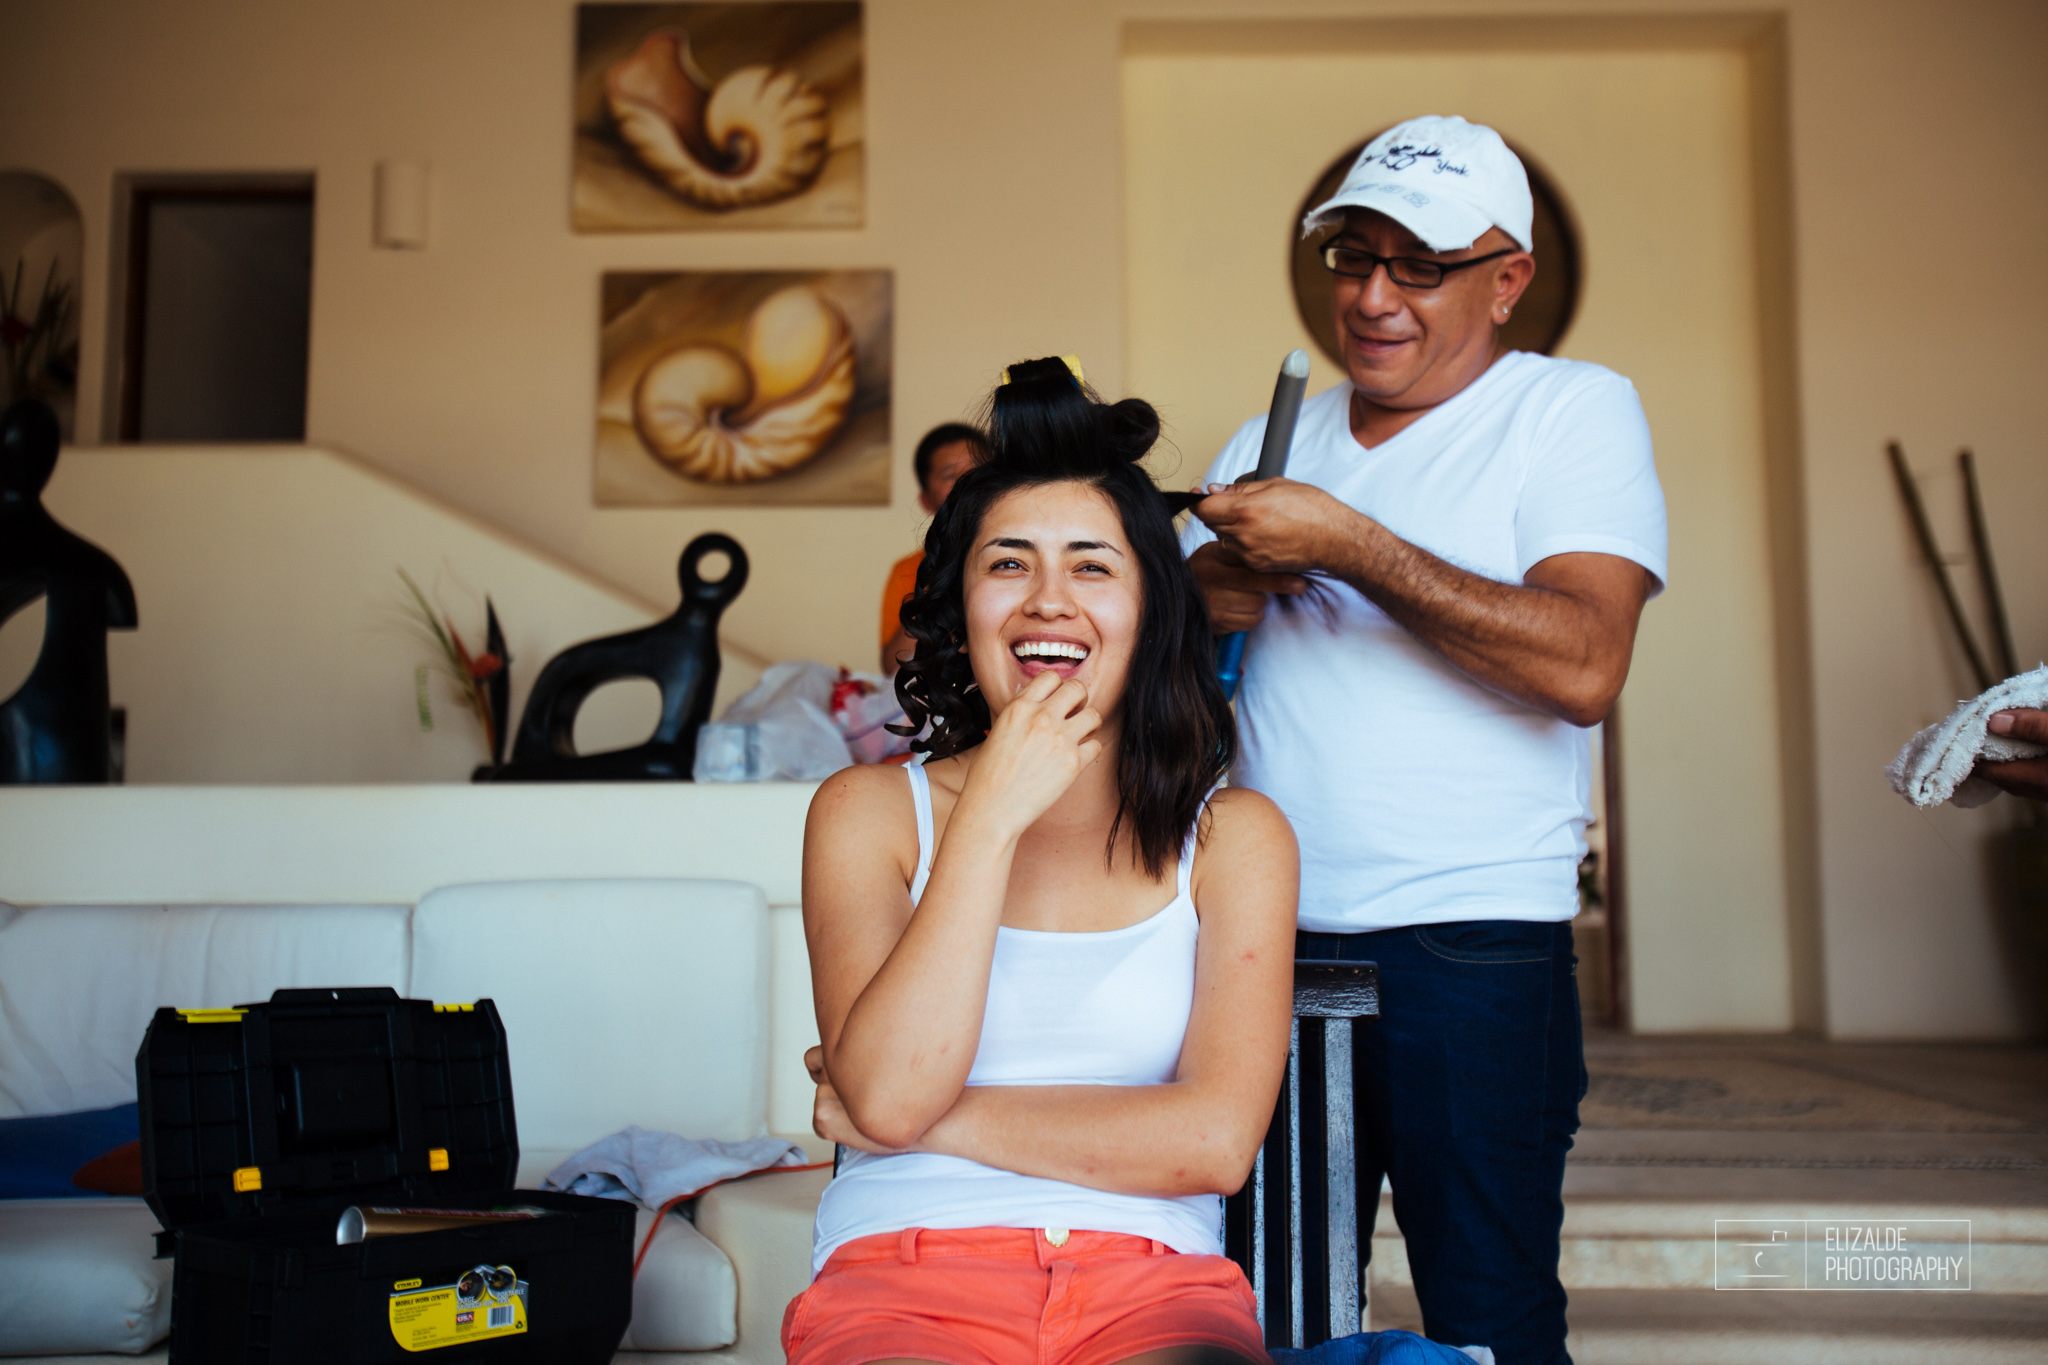 Pay and Ferran_Acapulco_Destination Wedding_Elizalde Photography-10.jpg